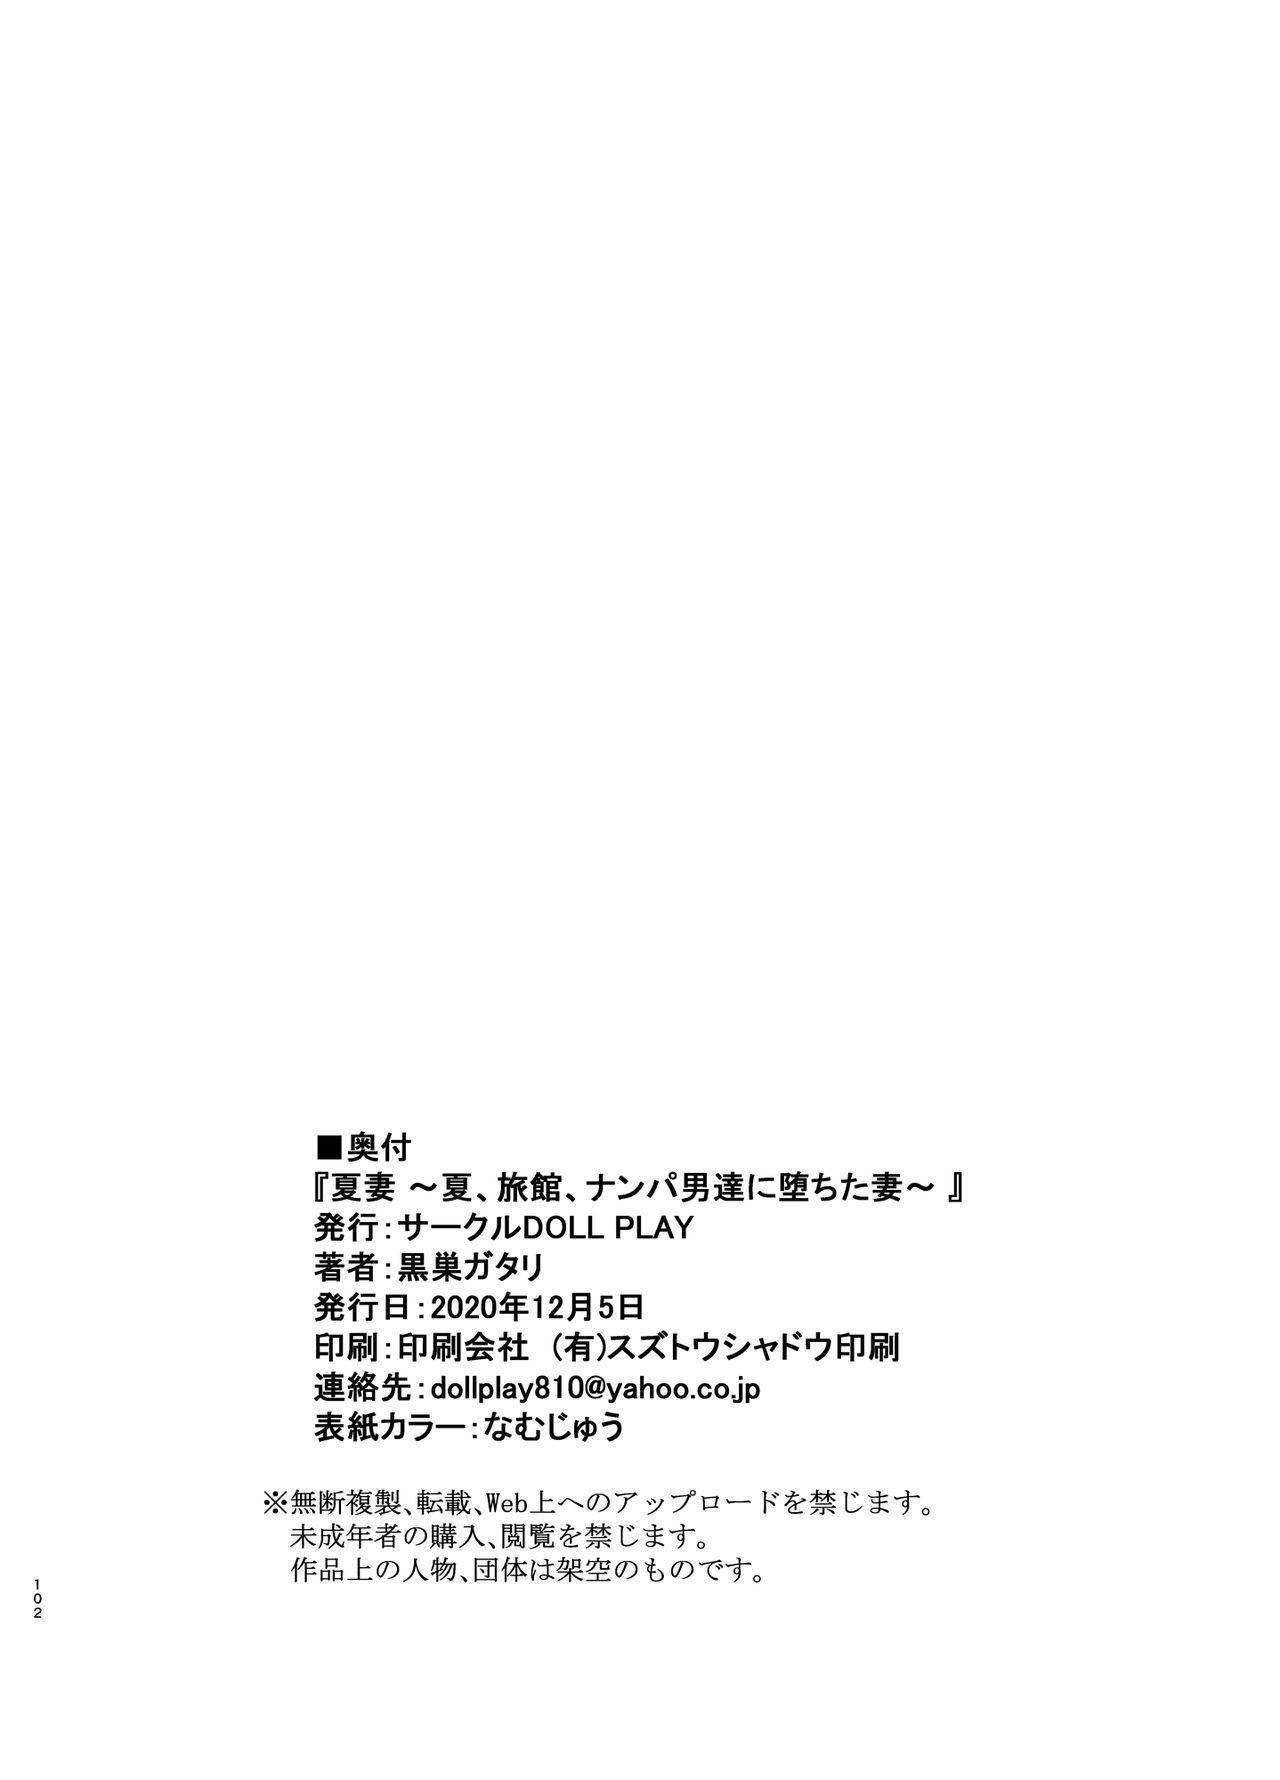 Natsuzuma 200